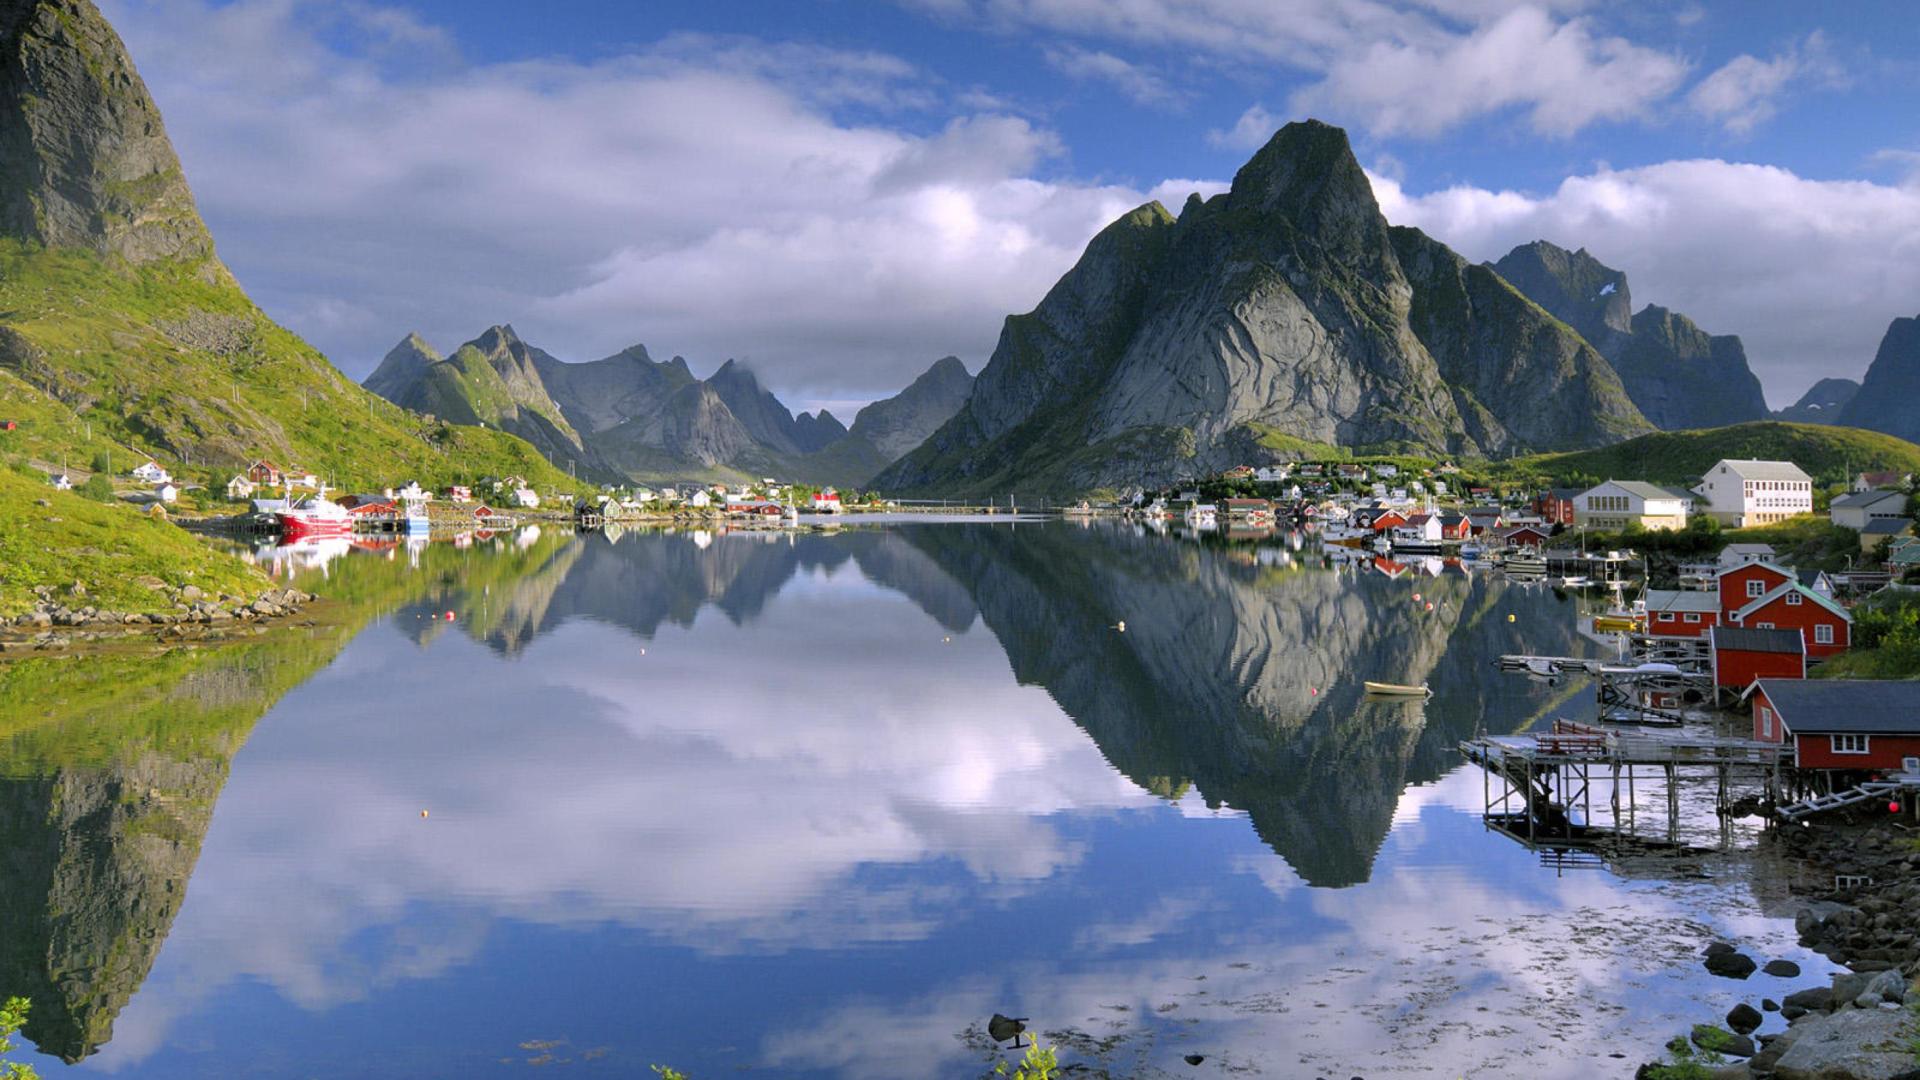 Lofoten Norway Hd Sfondi Gratuiti Per Desktop 1920x1080